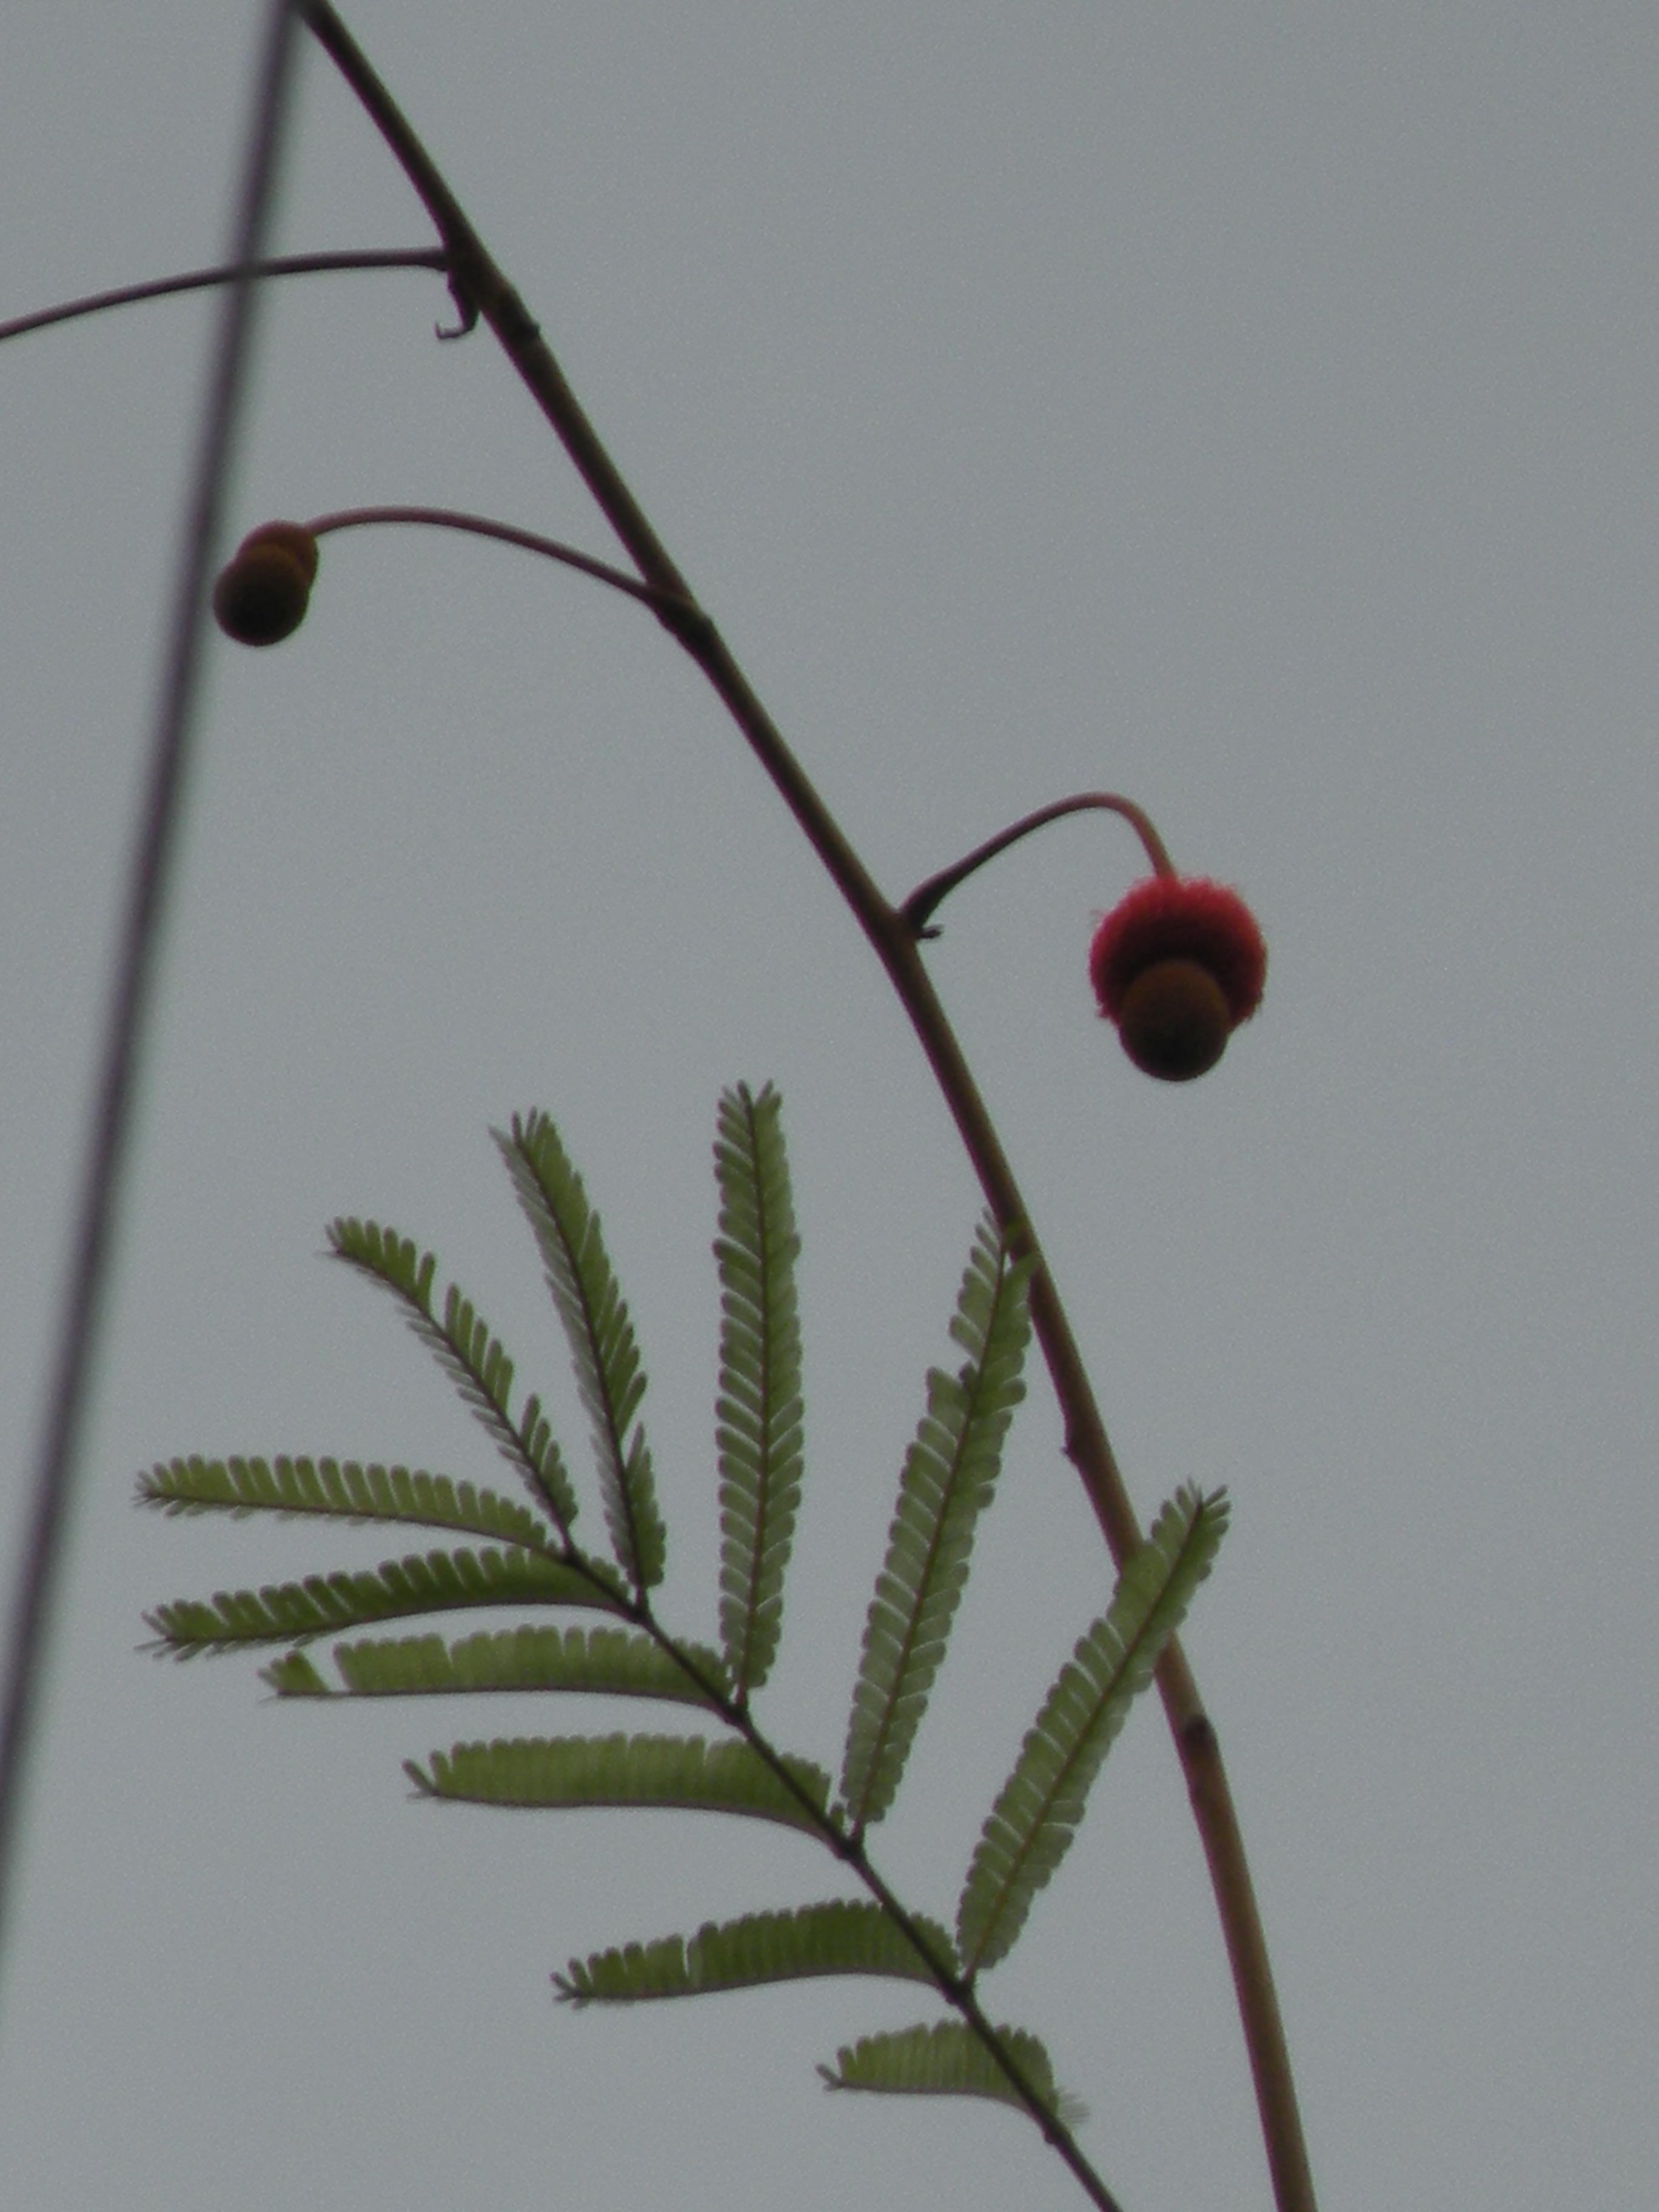 Specimen: Parkia igneiflora